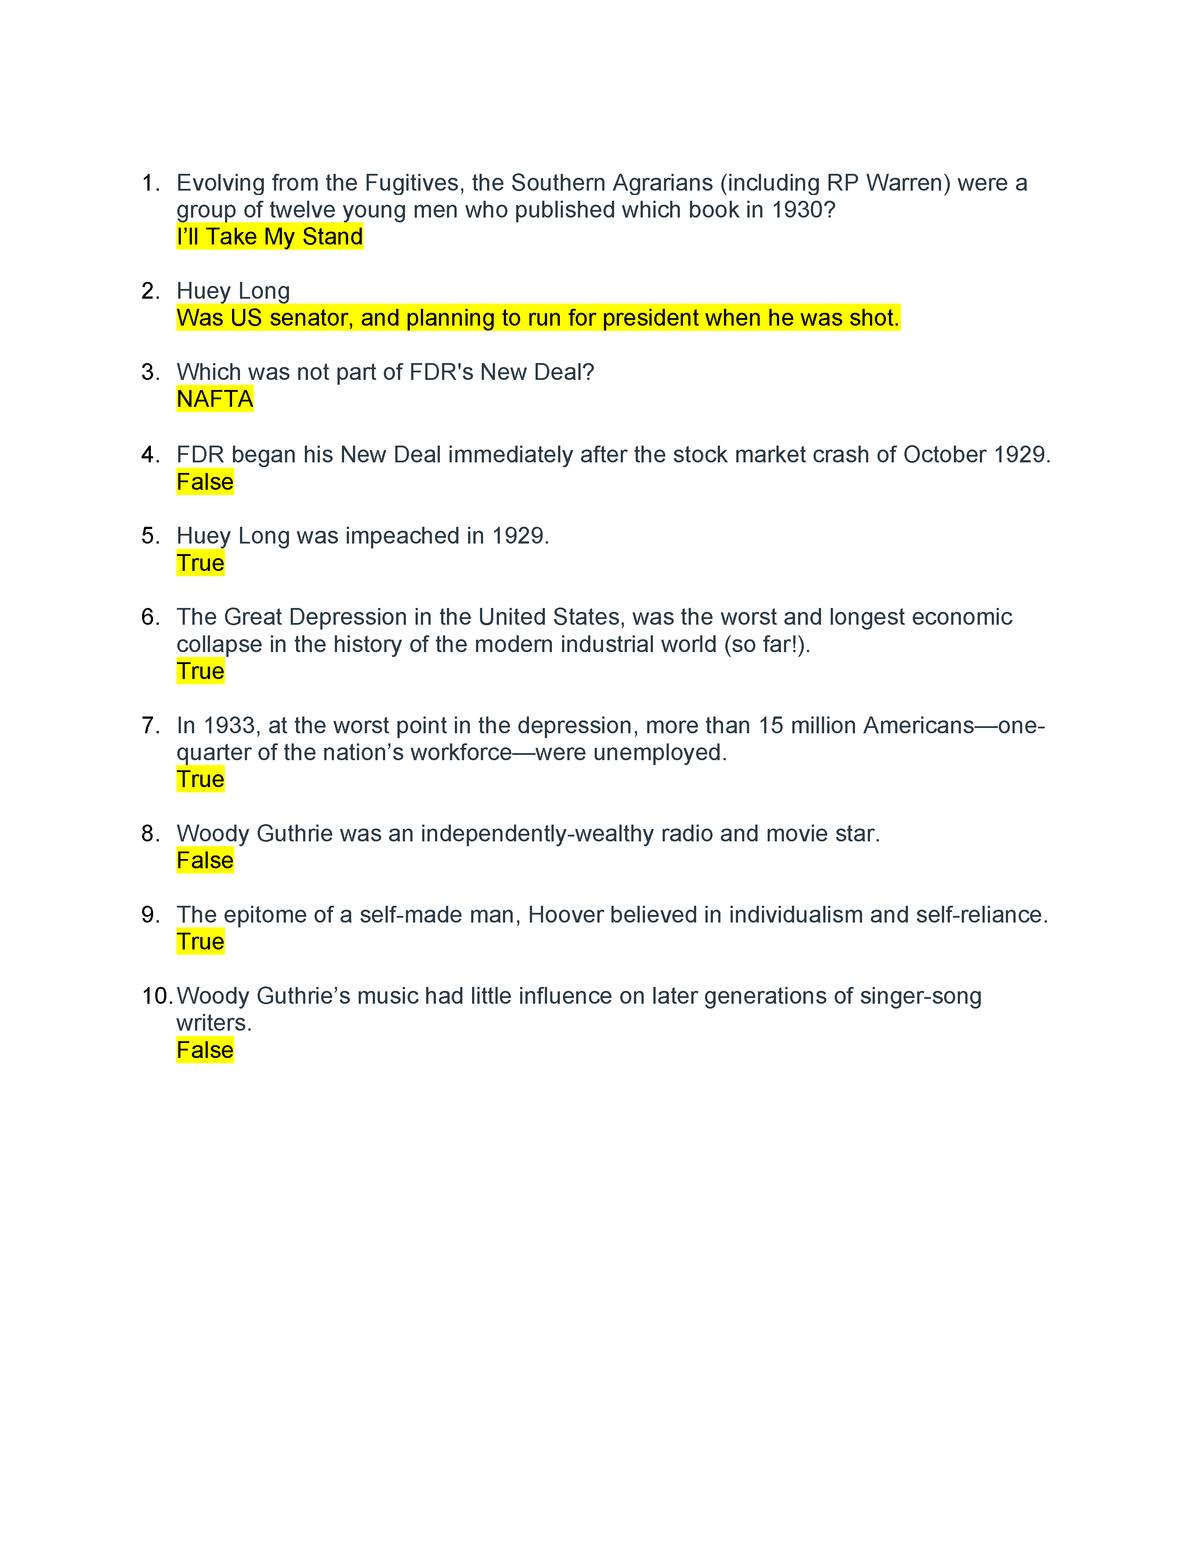 Exam 2018 - LBST 2101: Western History & Culture - StuDocu